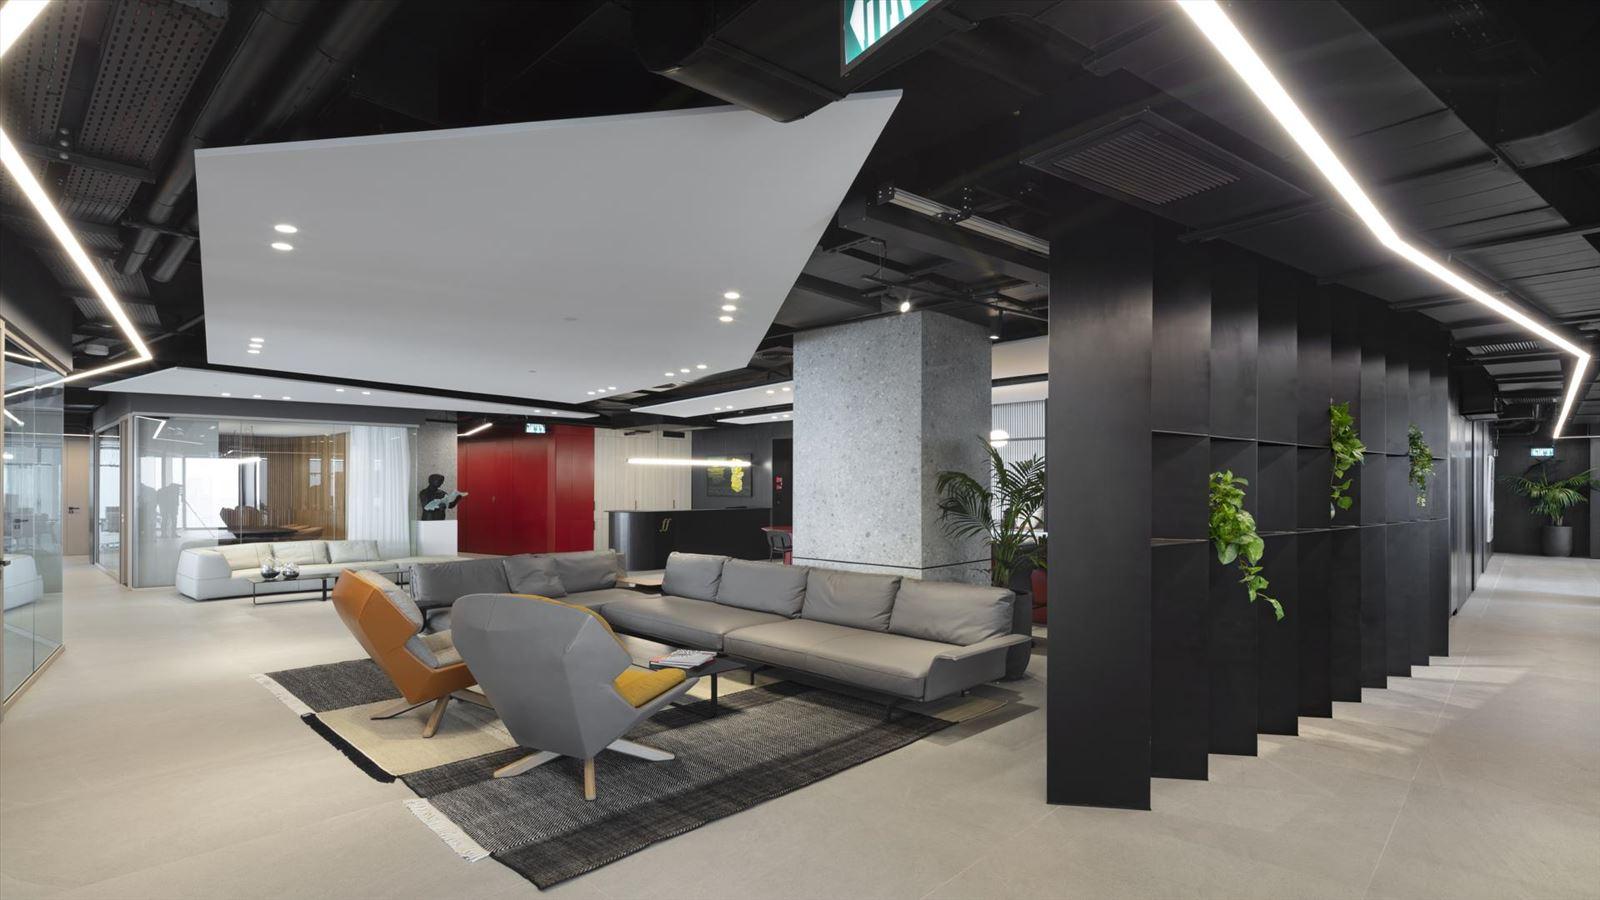 Fortissimo Offices – Tel Aviv חלל המשרד בגופי תאורה מיוחדים בתכנון דורי קמחי